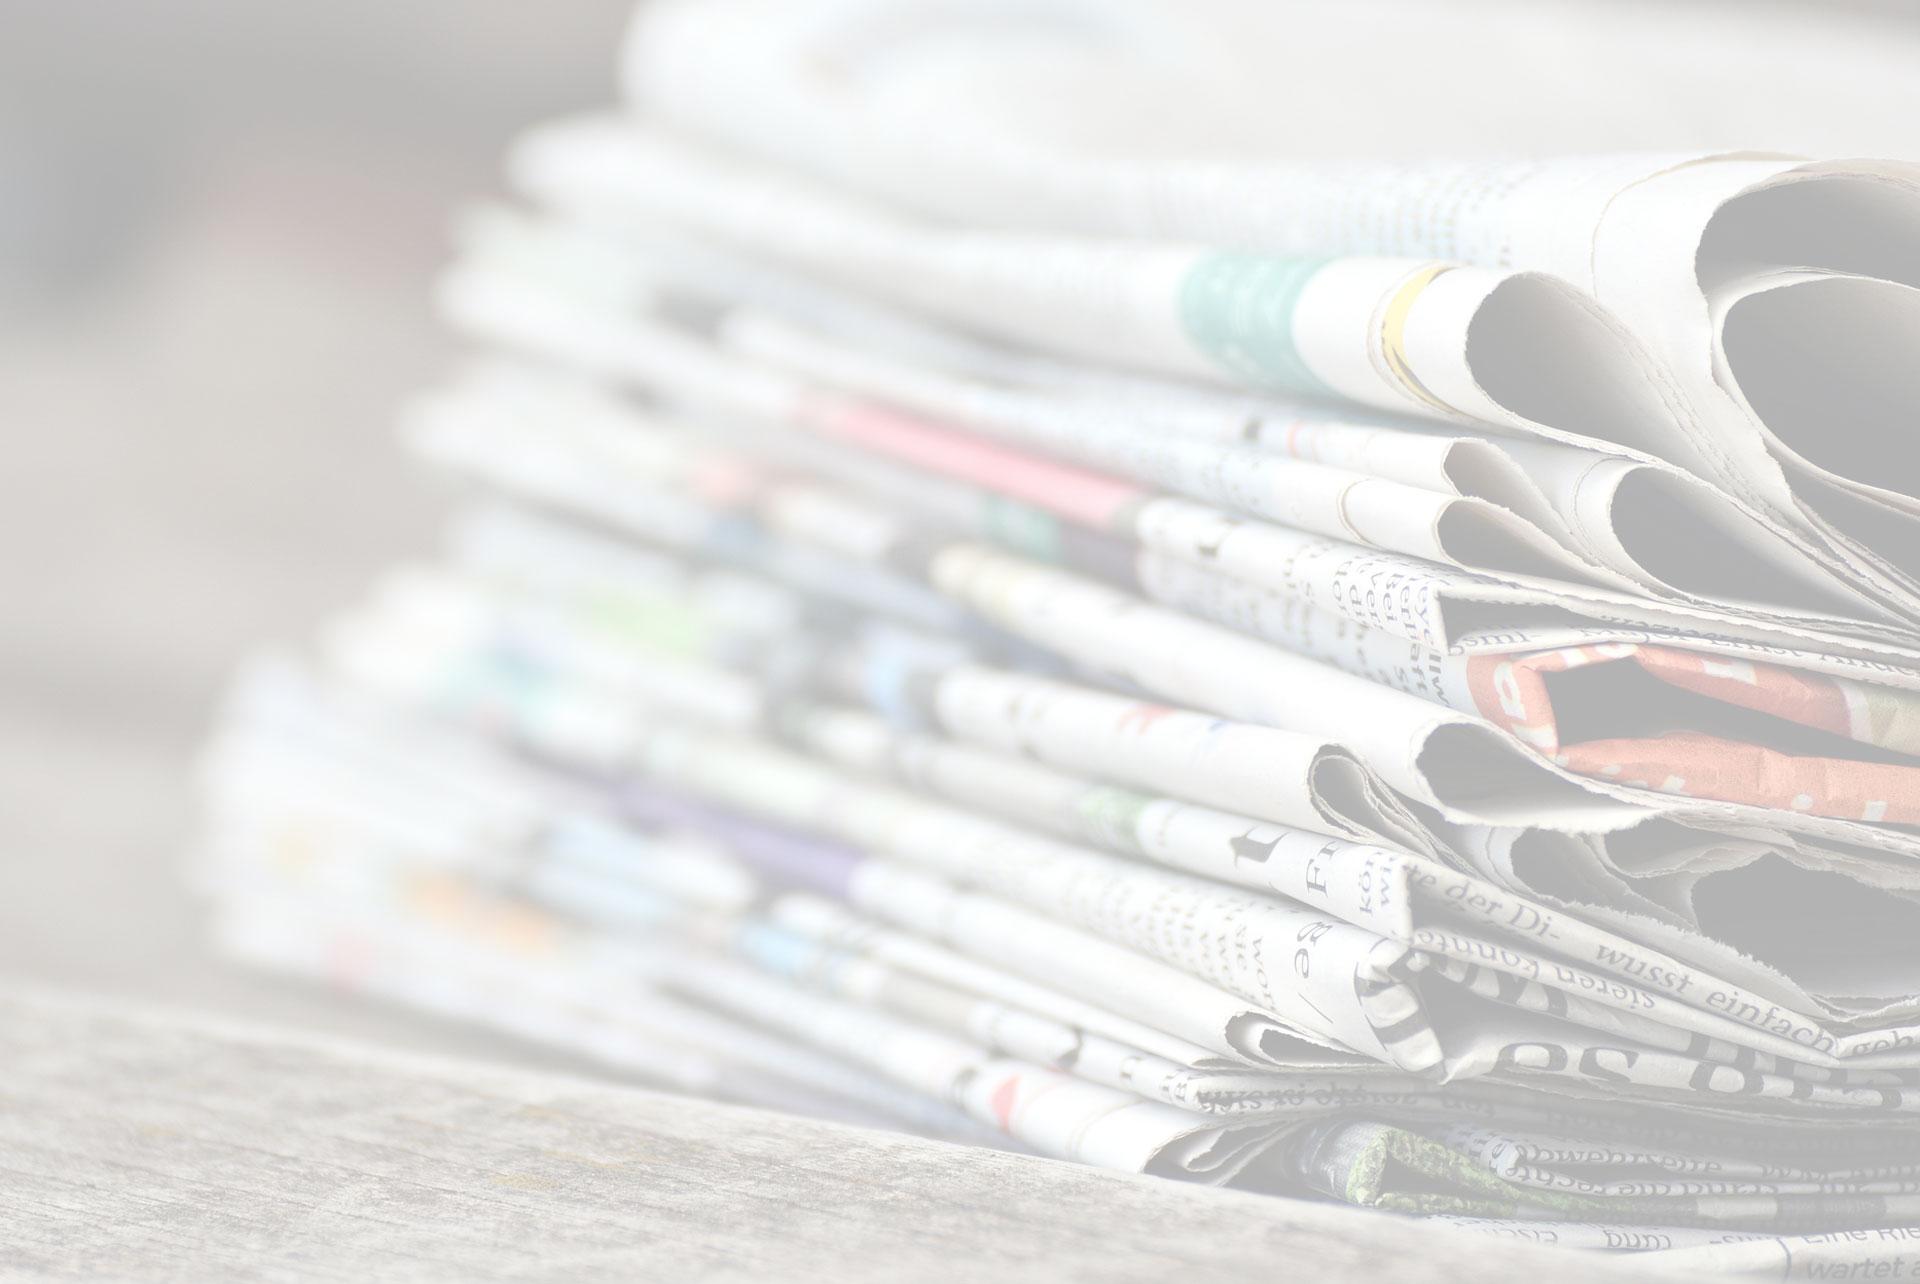 Marco Cocchi